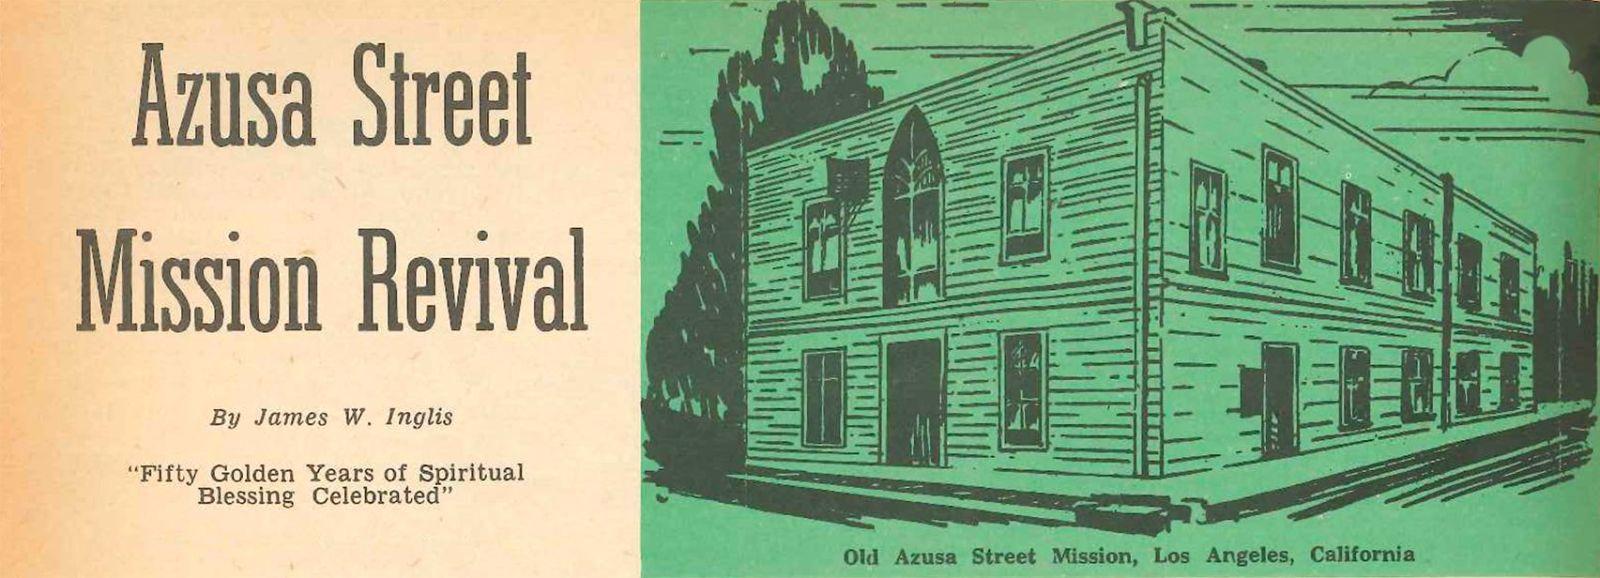 Azusa Street Mission Revival